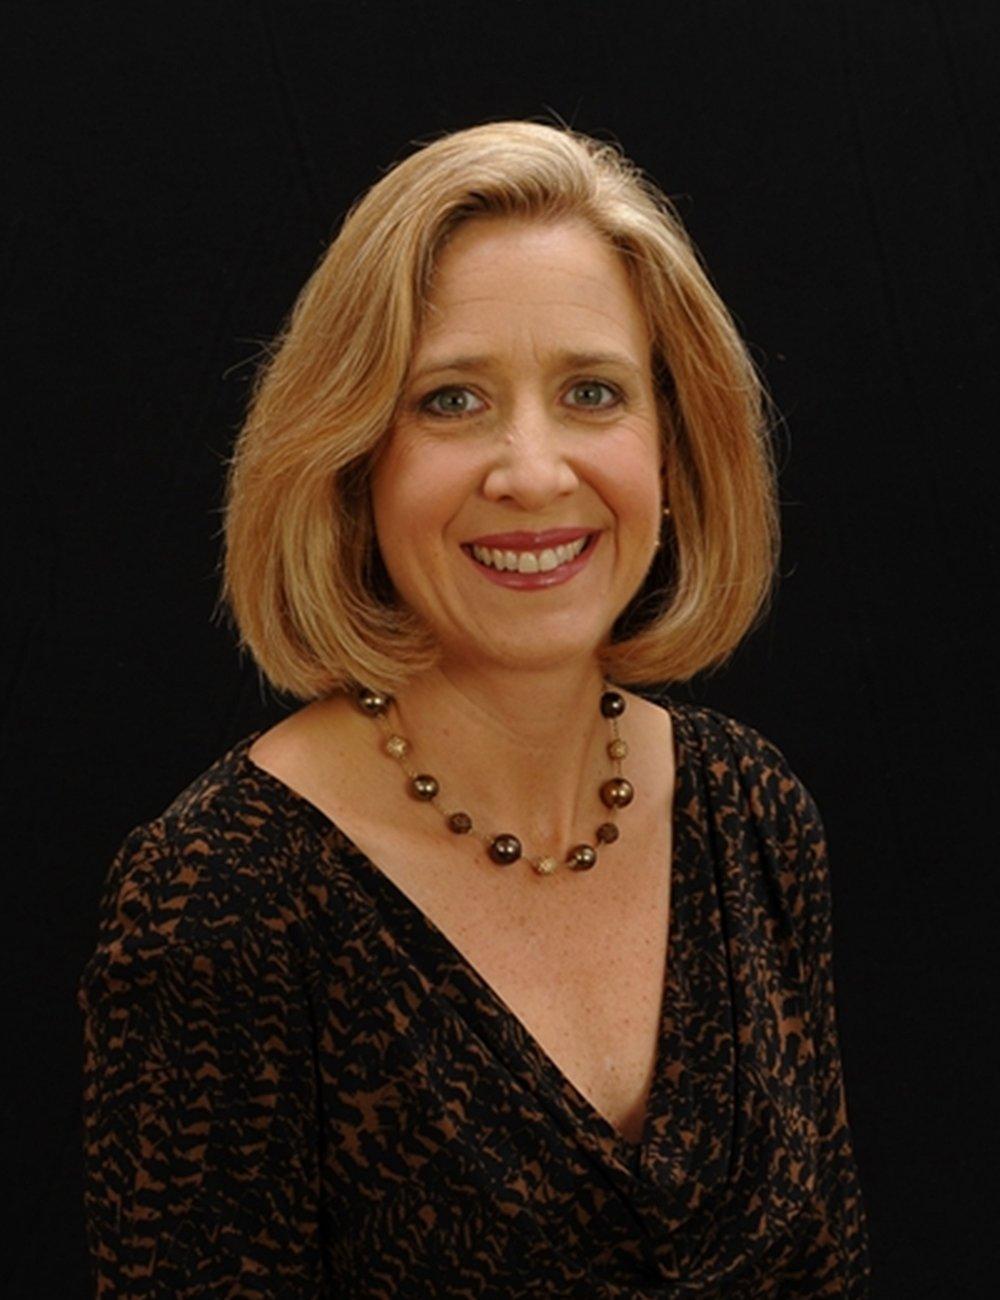 Wendy Gattis-Stough (Expert Medical Communication, USA)